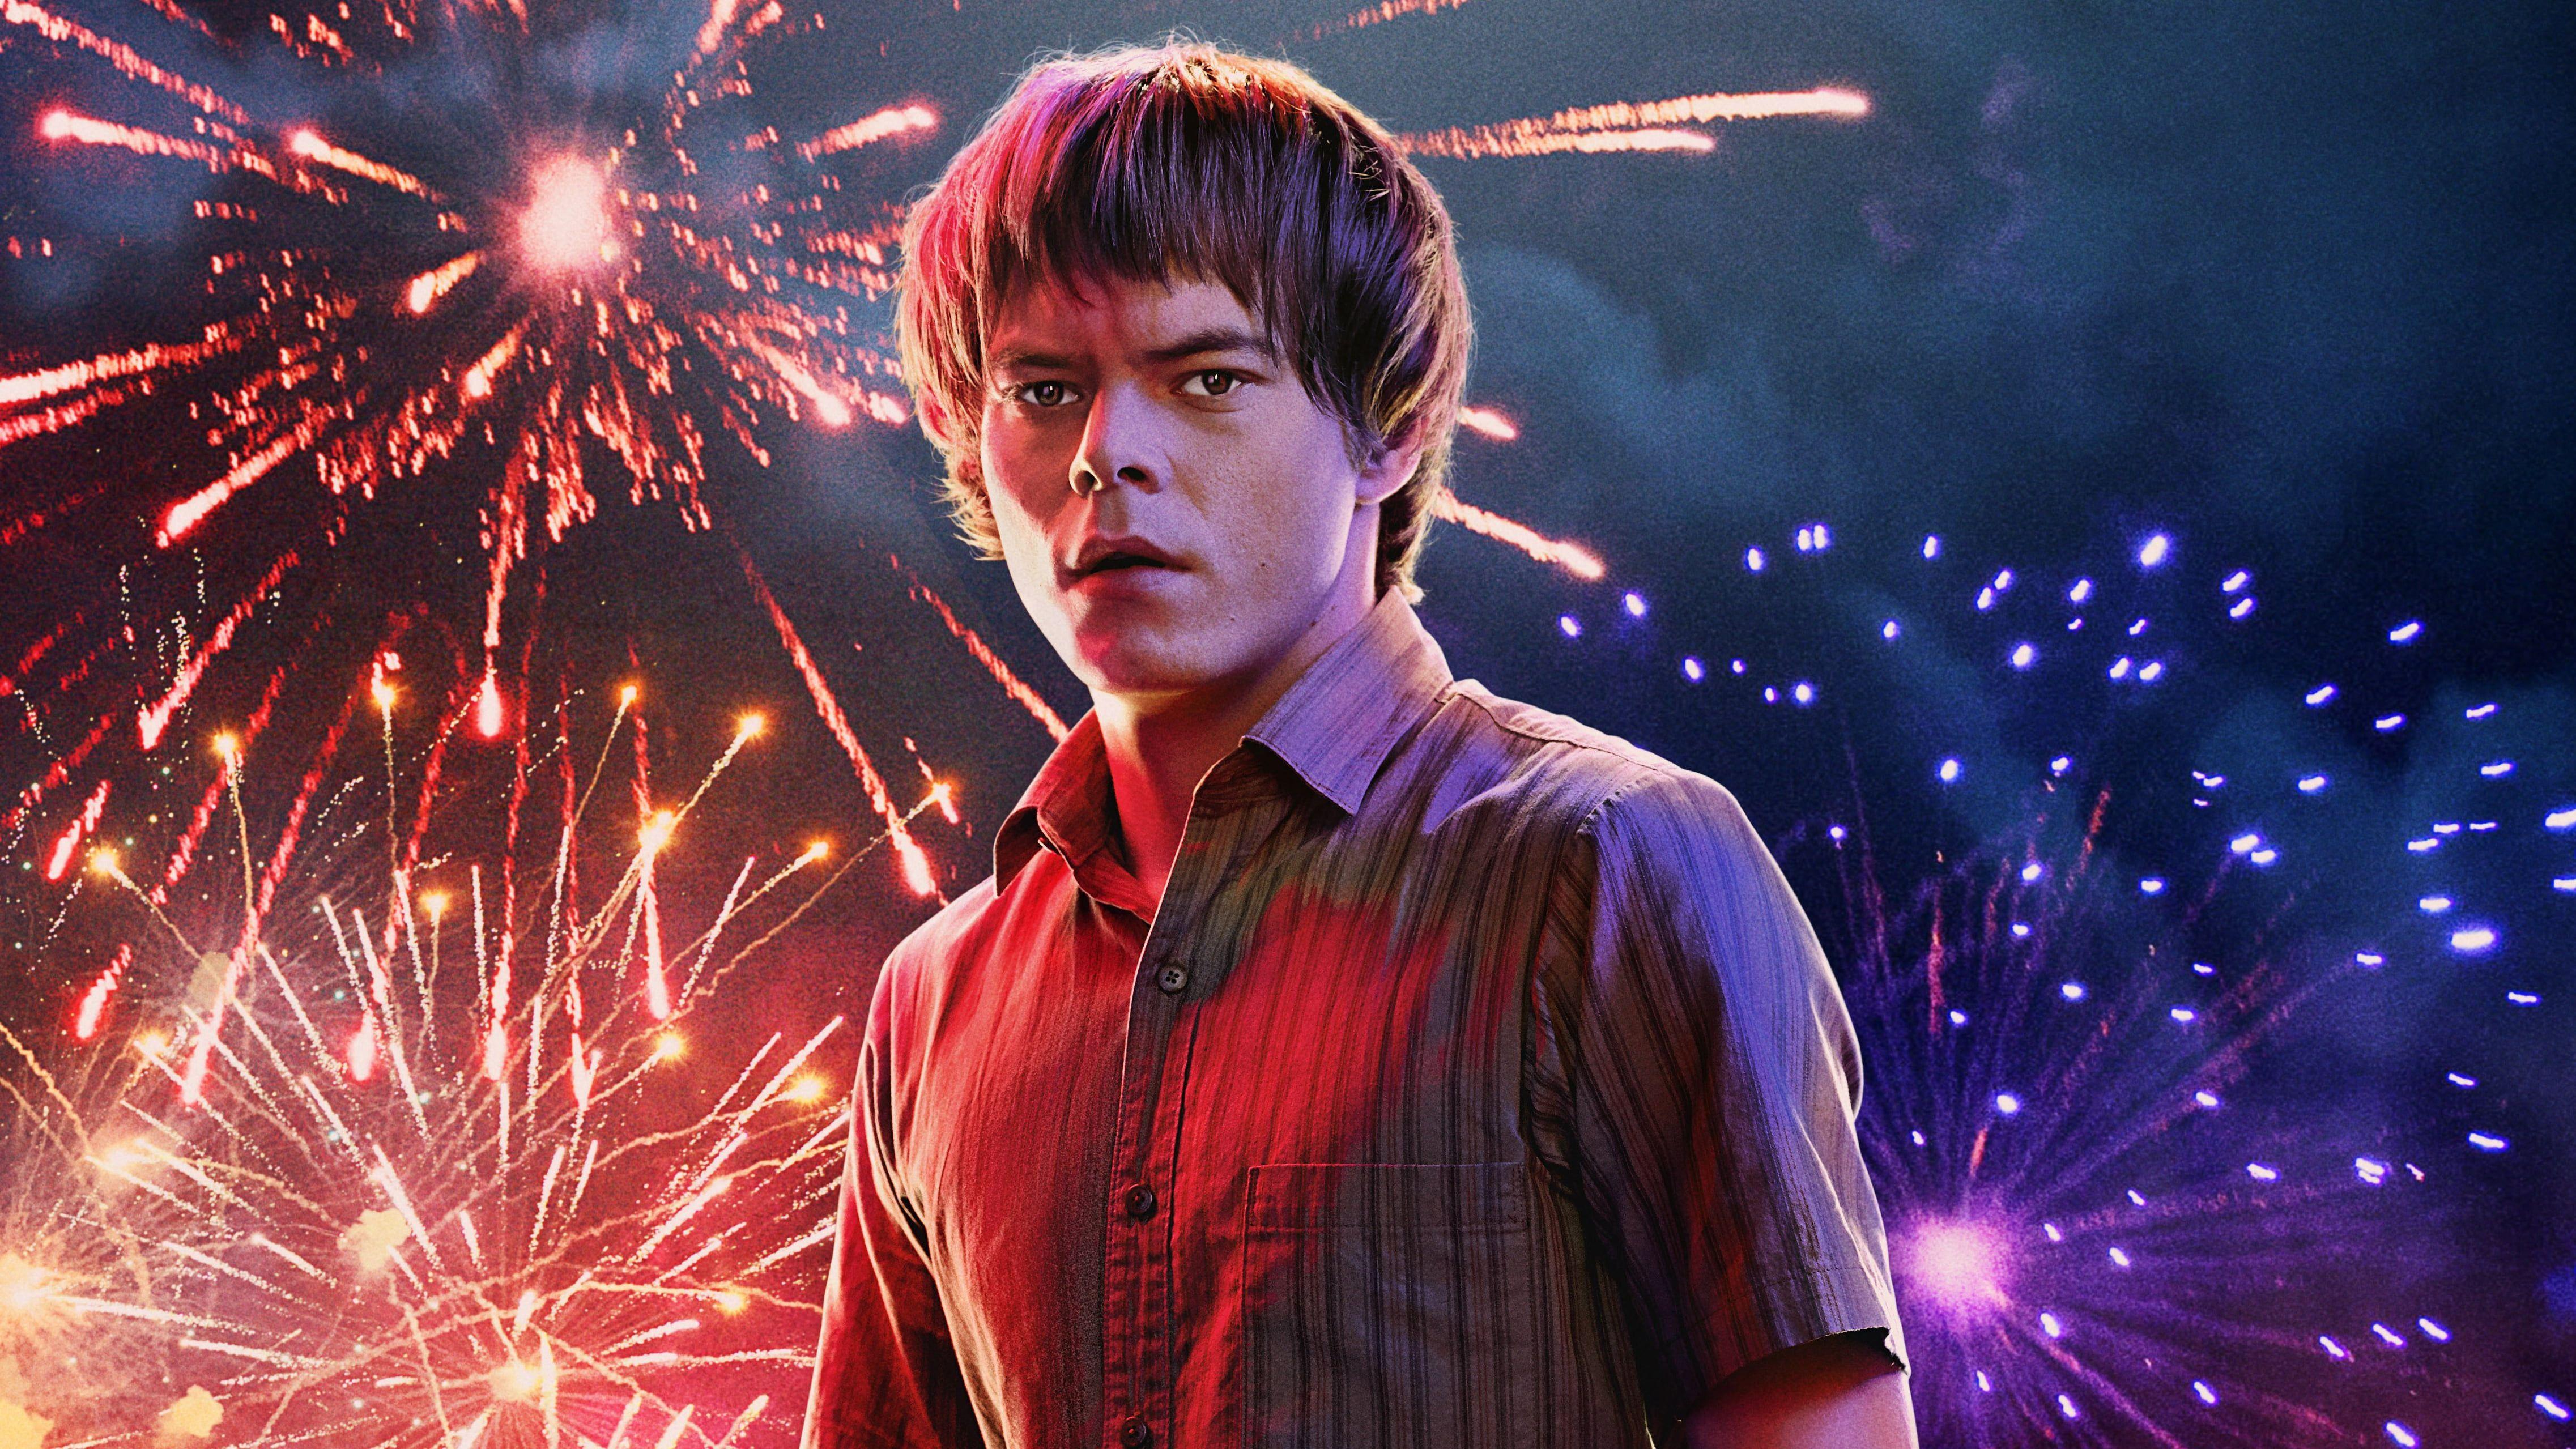 HD wallpaper: TV Show, Stranger Things, Charlie Heaton, Jonathan Byers, Stranger Things - Season 3